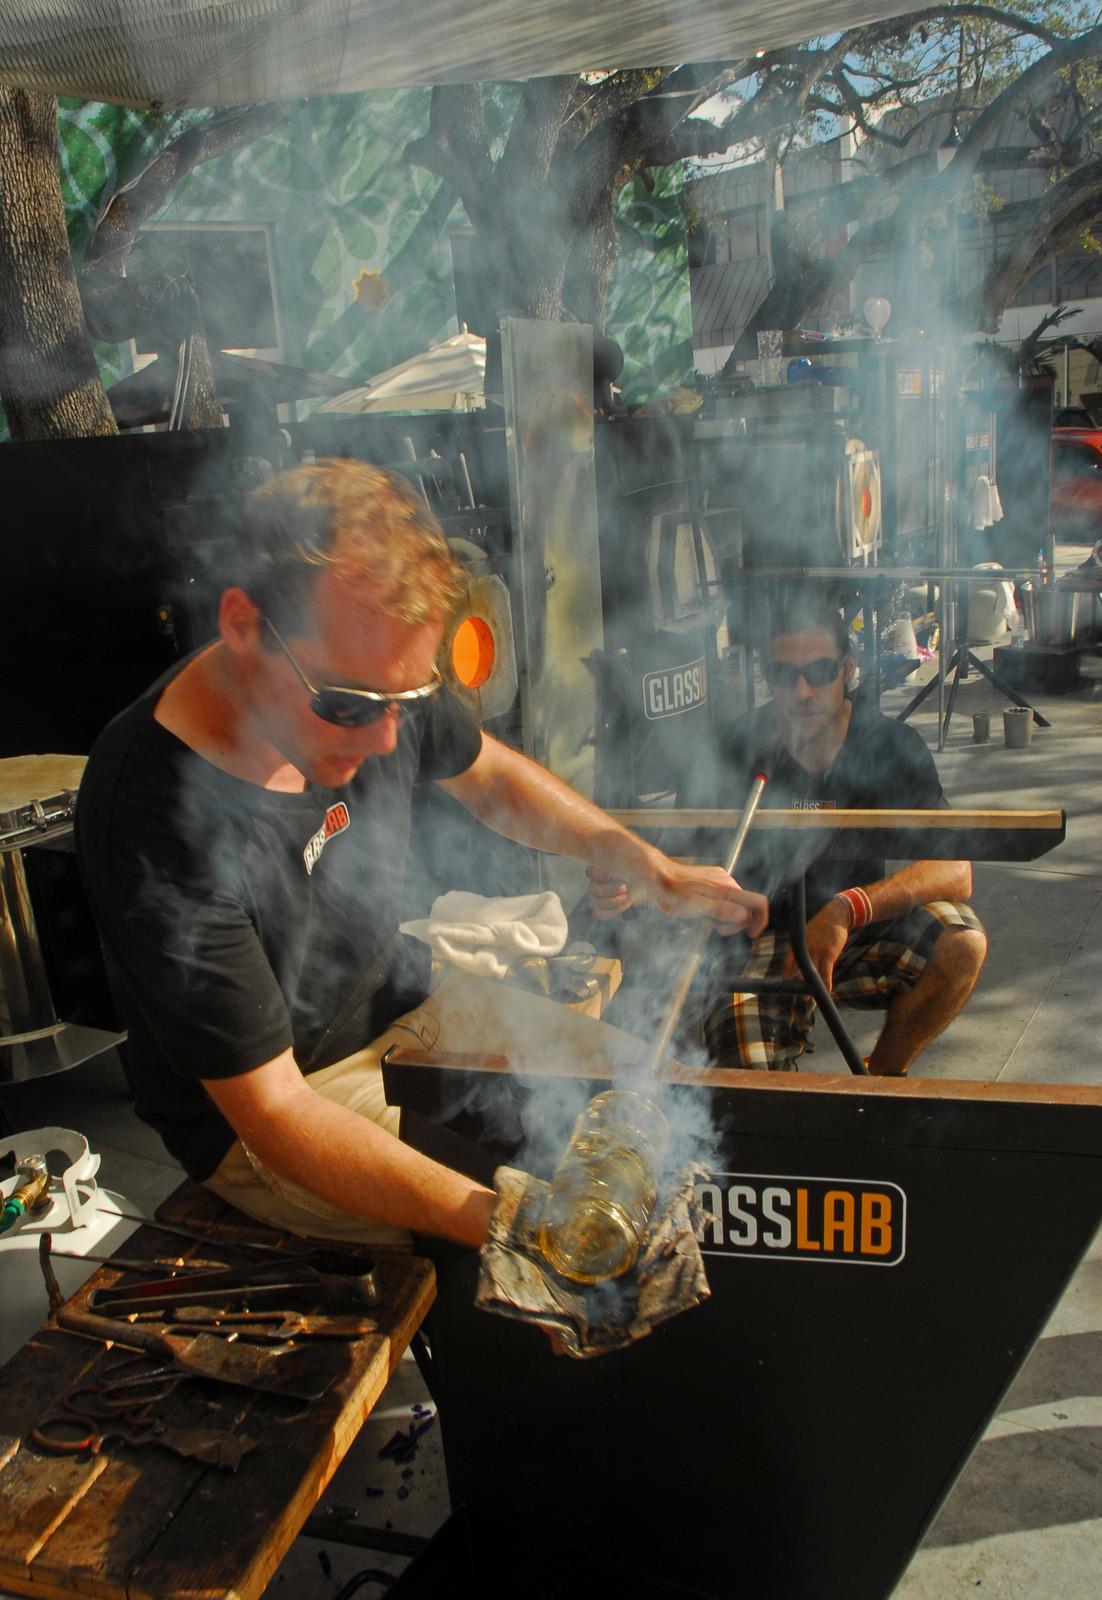 GlassLab at Design Miami 2007